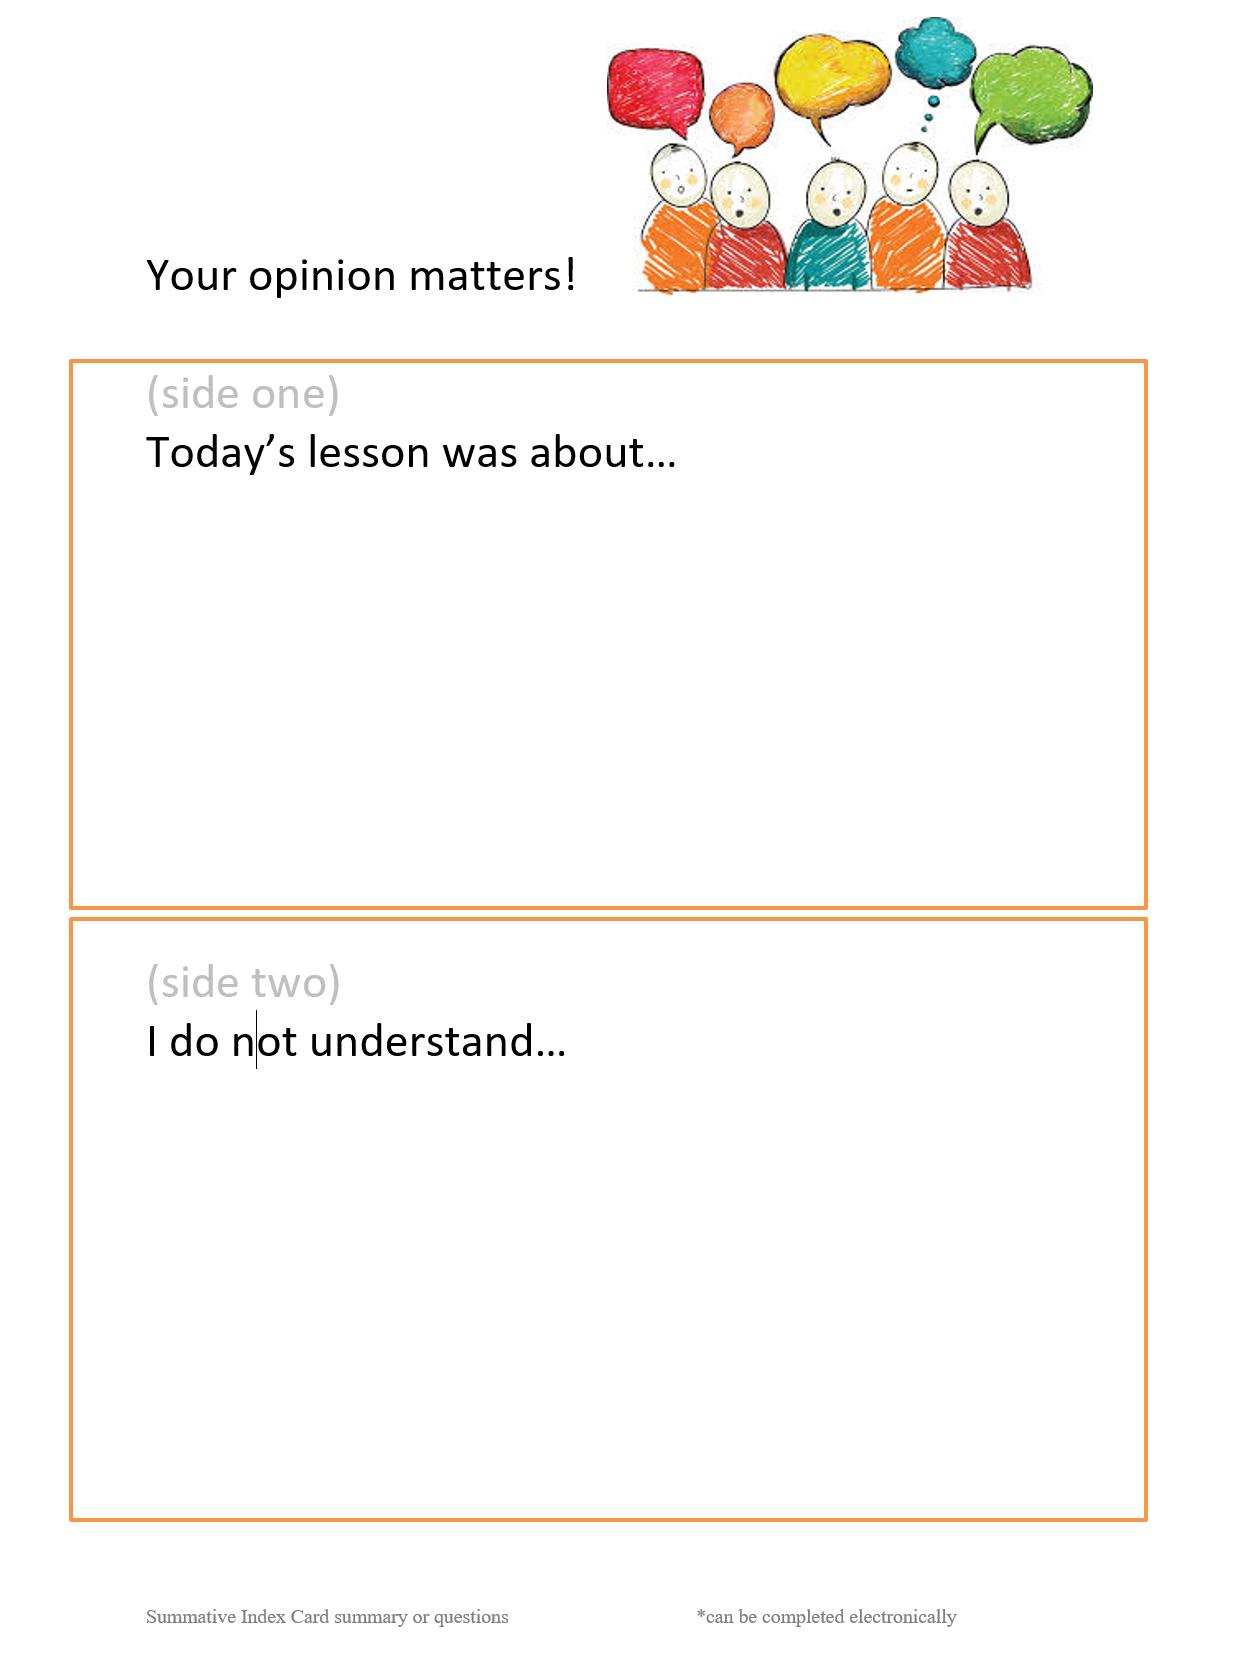 summative index card for student - learner feedback